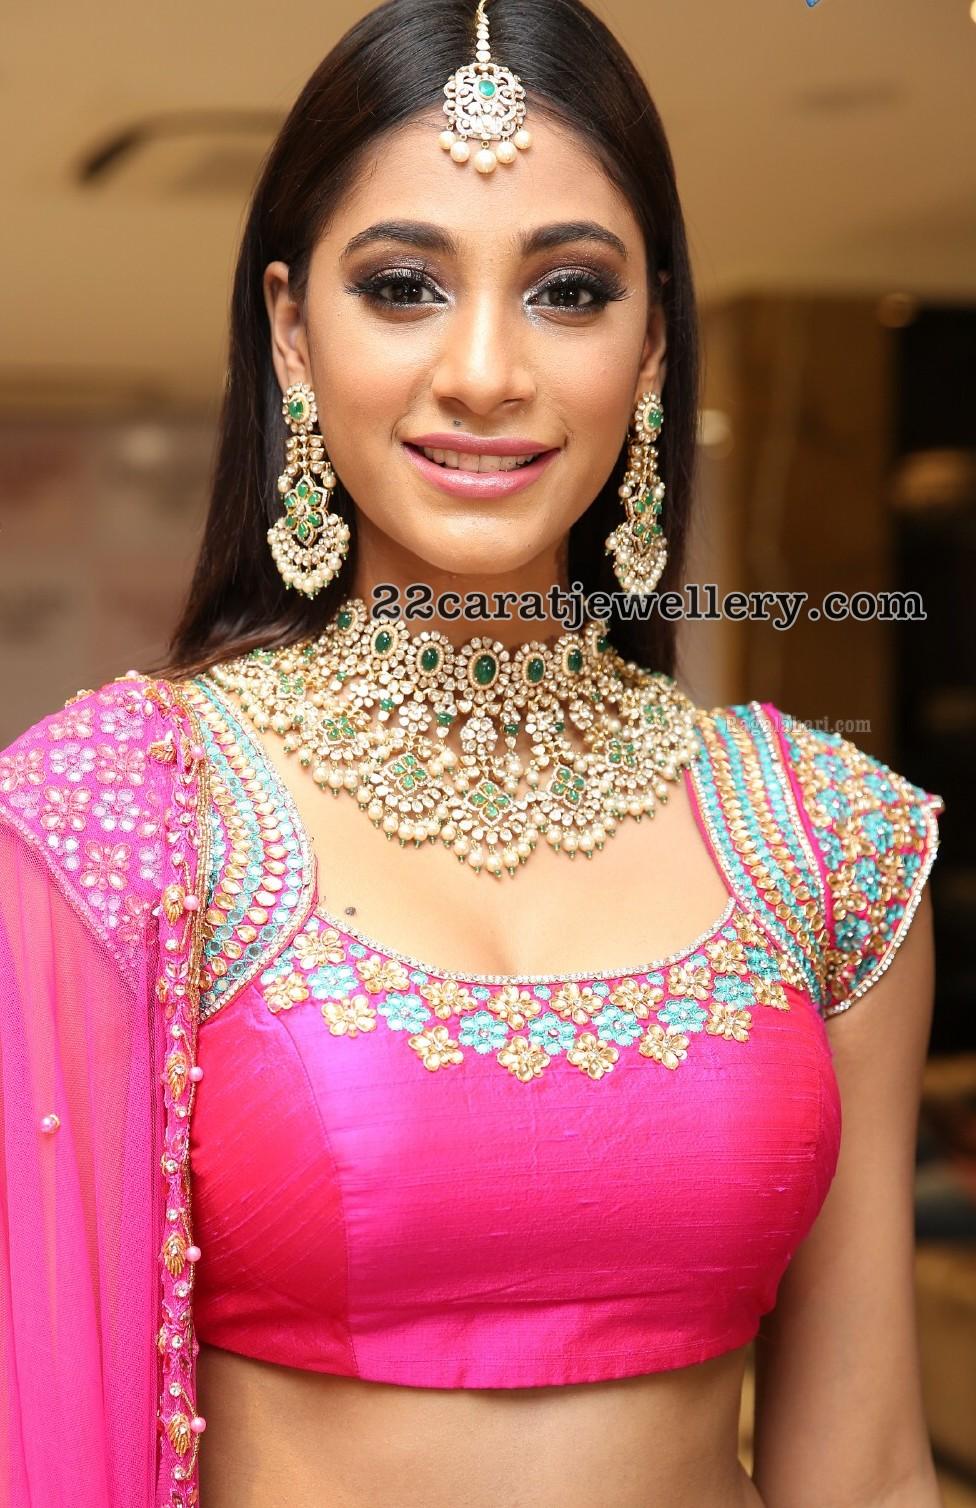 Akruthi Vyas Heavy Polki Diamond Necklace Jewellery Designs